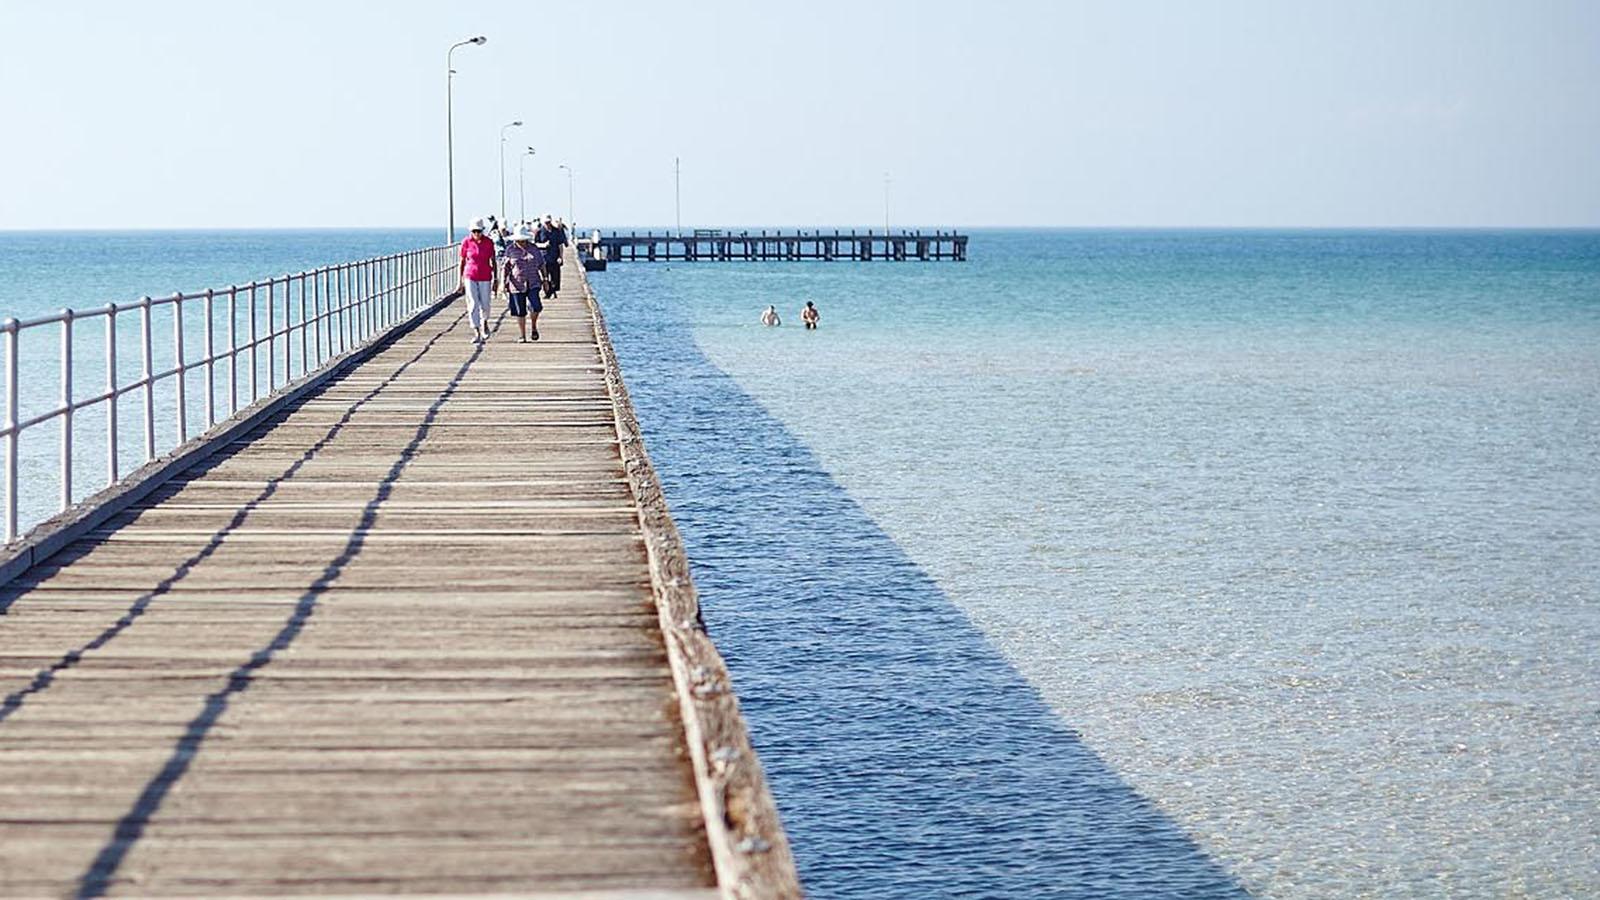 Rye Pier, Mornington Peninsula, Victoria, Australia